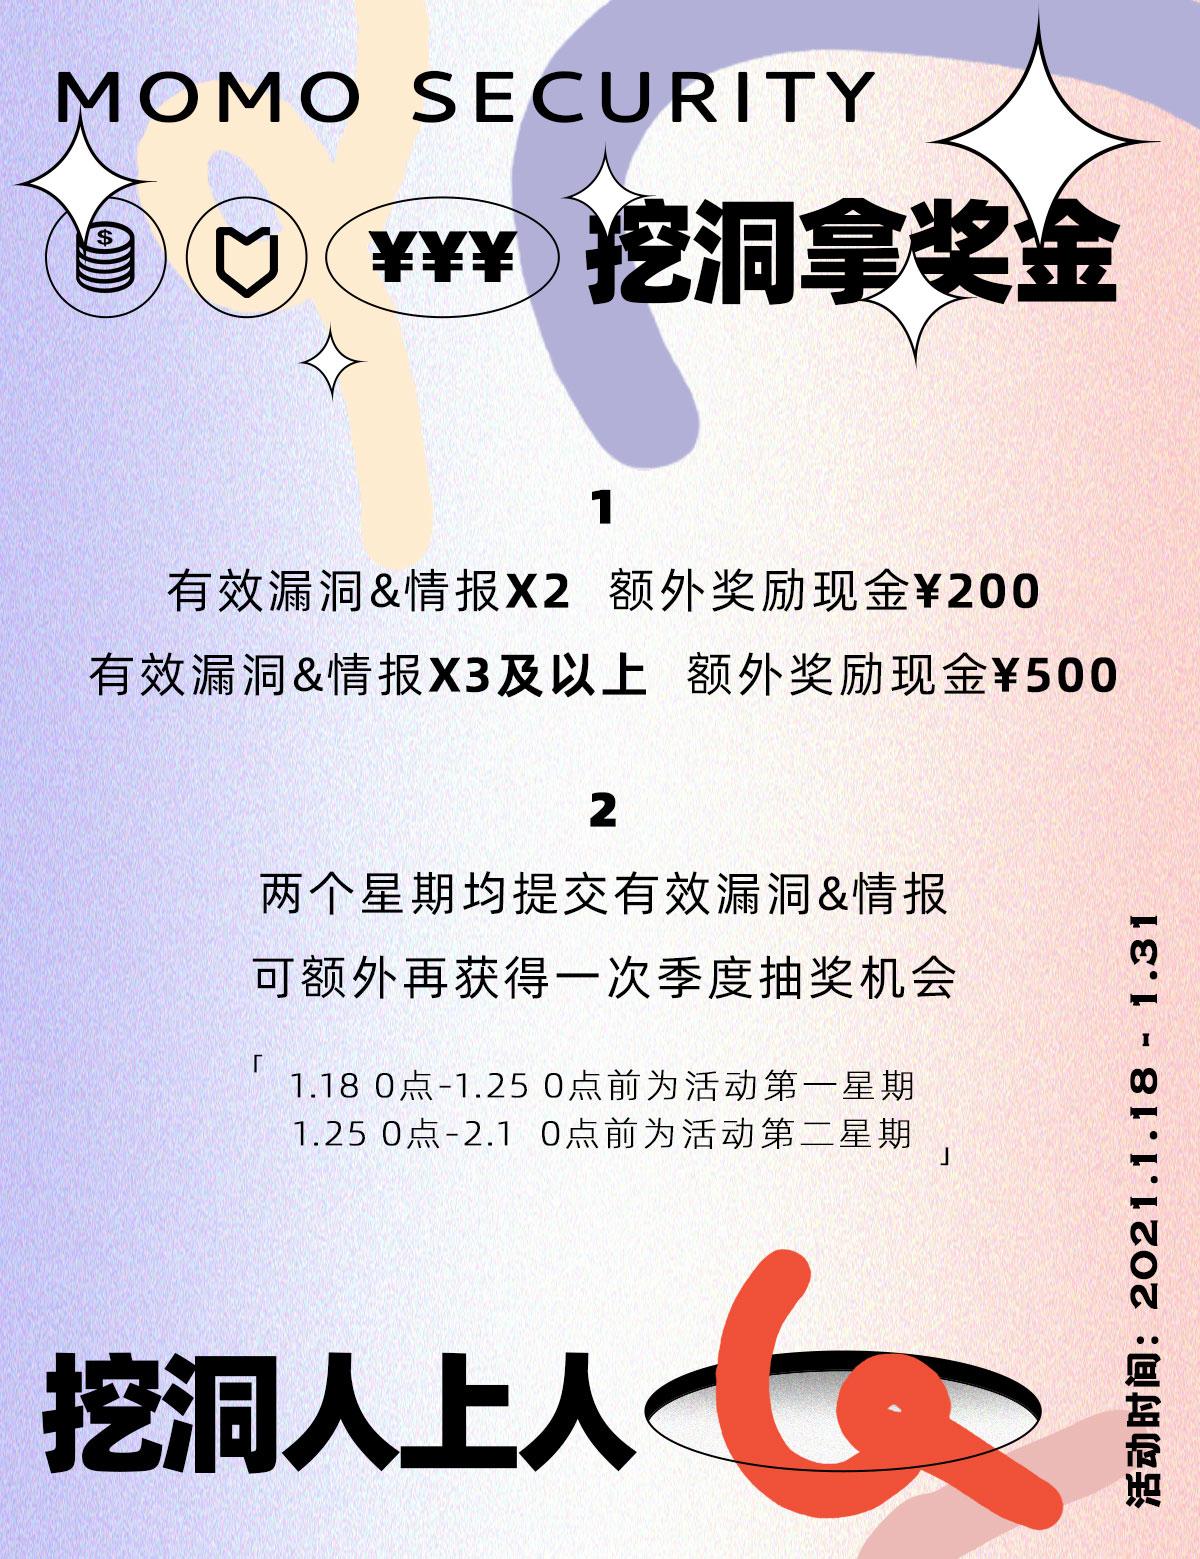 https://momo-mmsrc.oss-cn-hangzhou.aliyuncs.com/img-ba0888c8-9ded-3824-af44-9ea669a7b8c3.jpeg